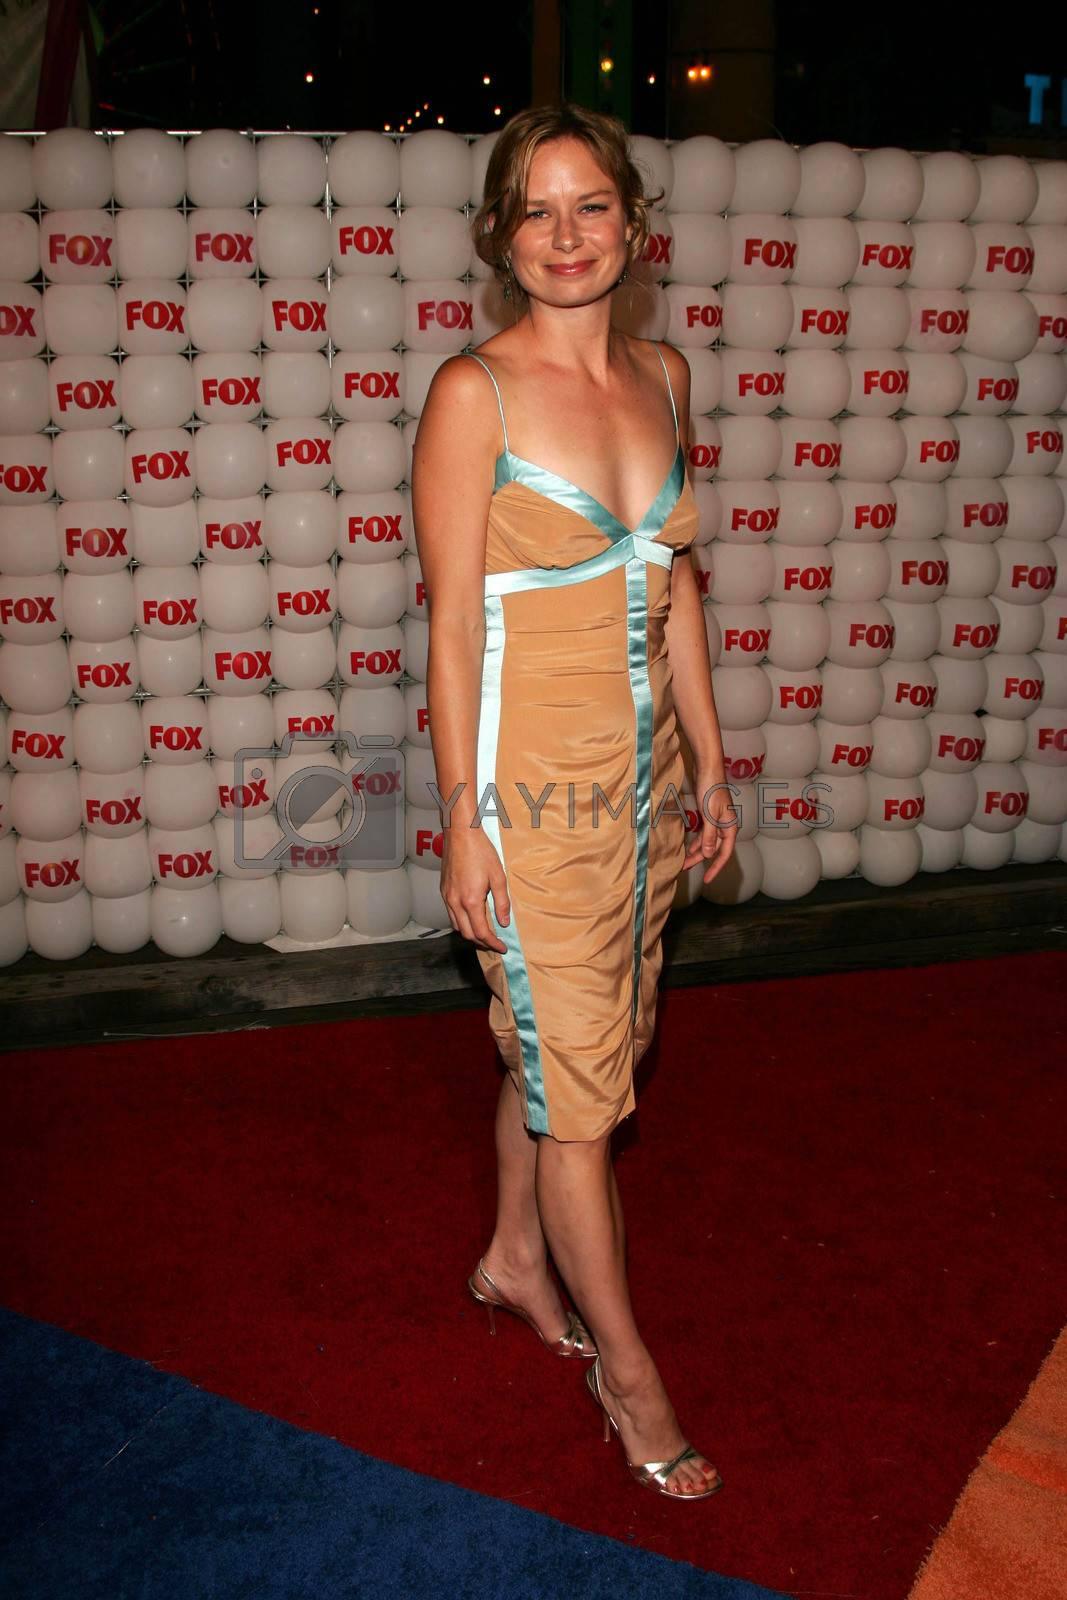 Mary Lynn Rajskub At the FOX Summer 2005 TCA Party, Santa Monica Pier, Santa Monica, CA 07-29-05